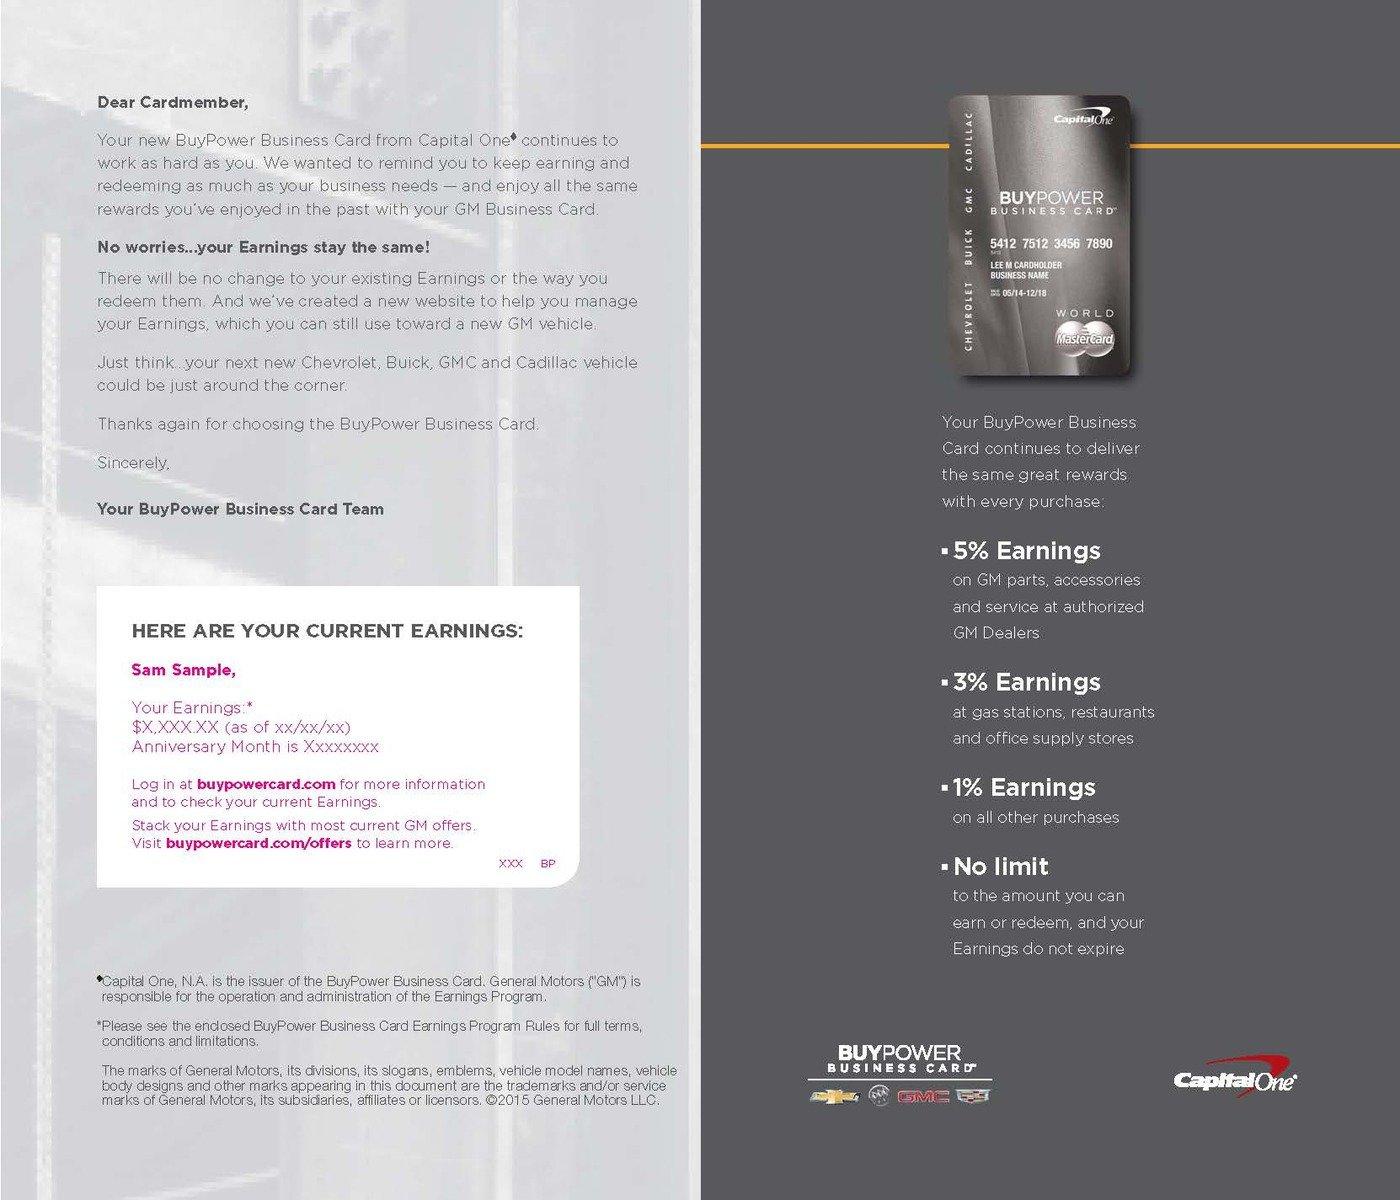 BuyPower Business Card Brochure by Stephanie Fujiwara at Coroflot.com